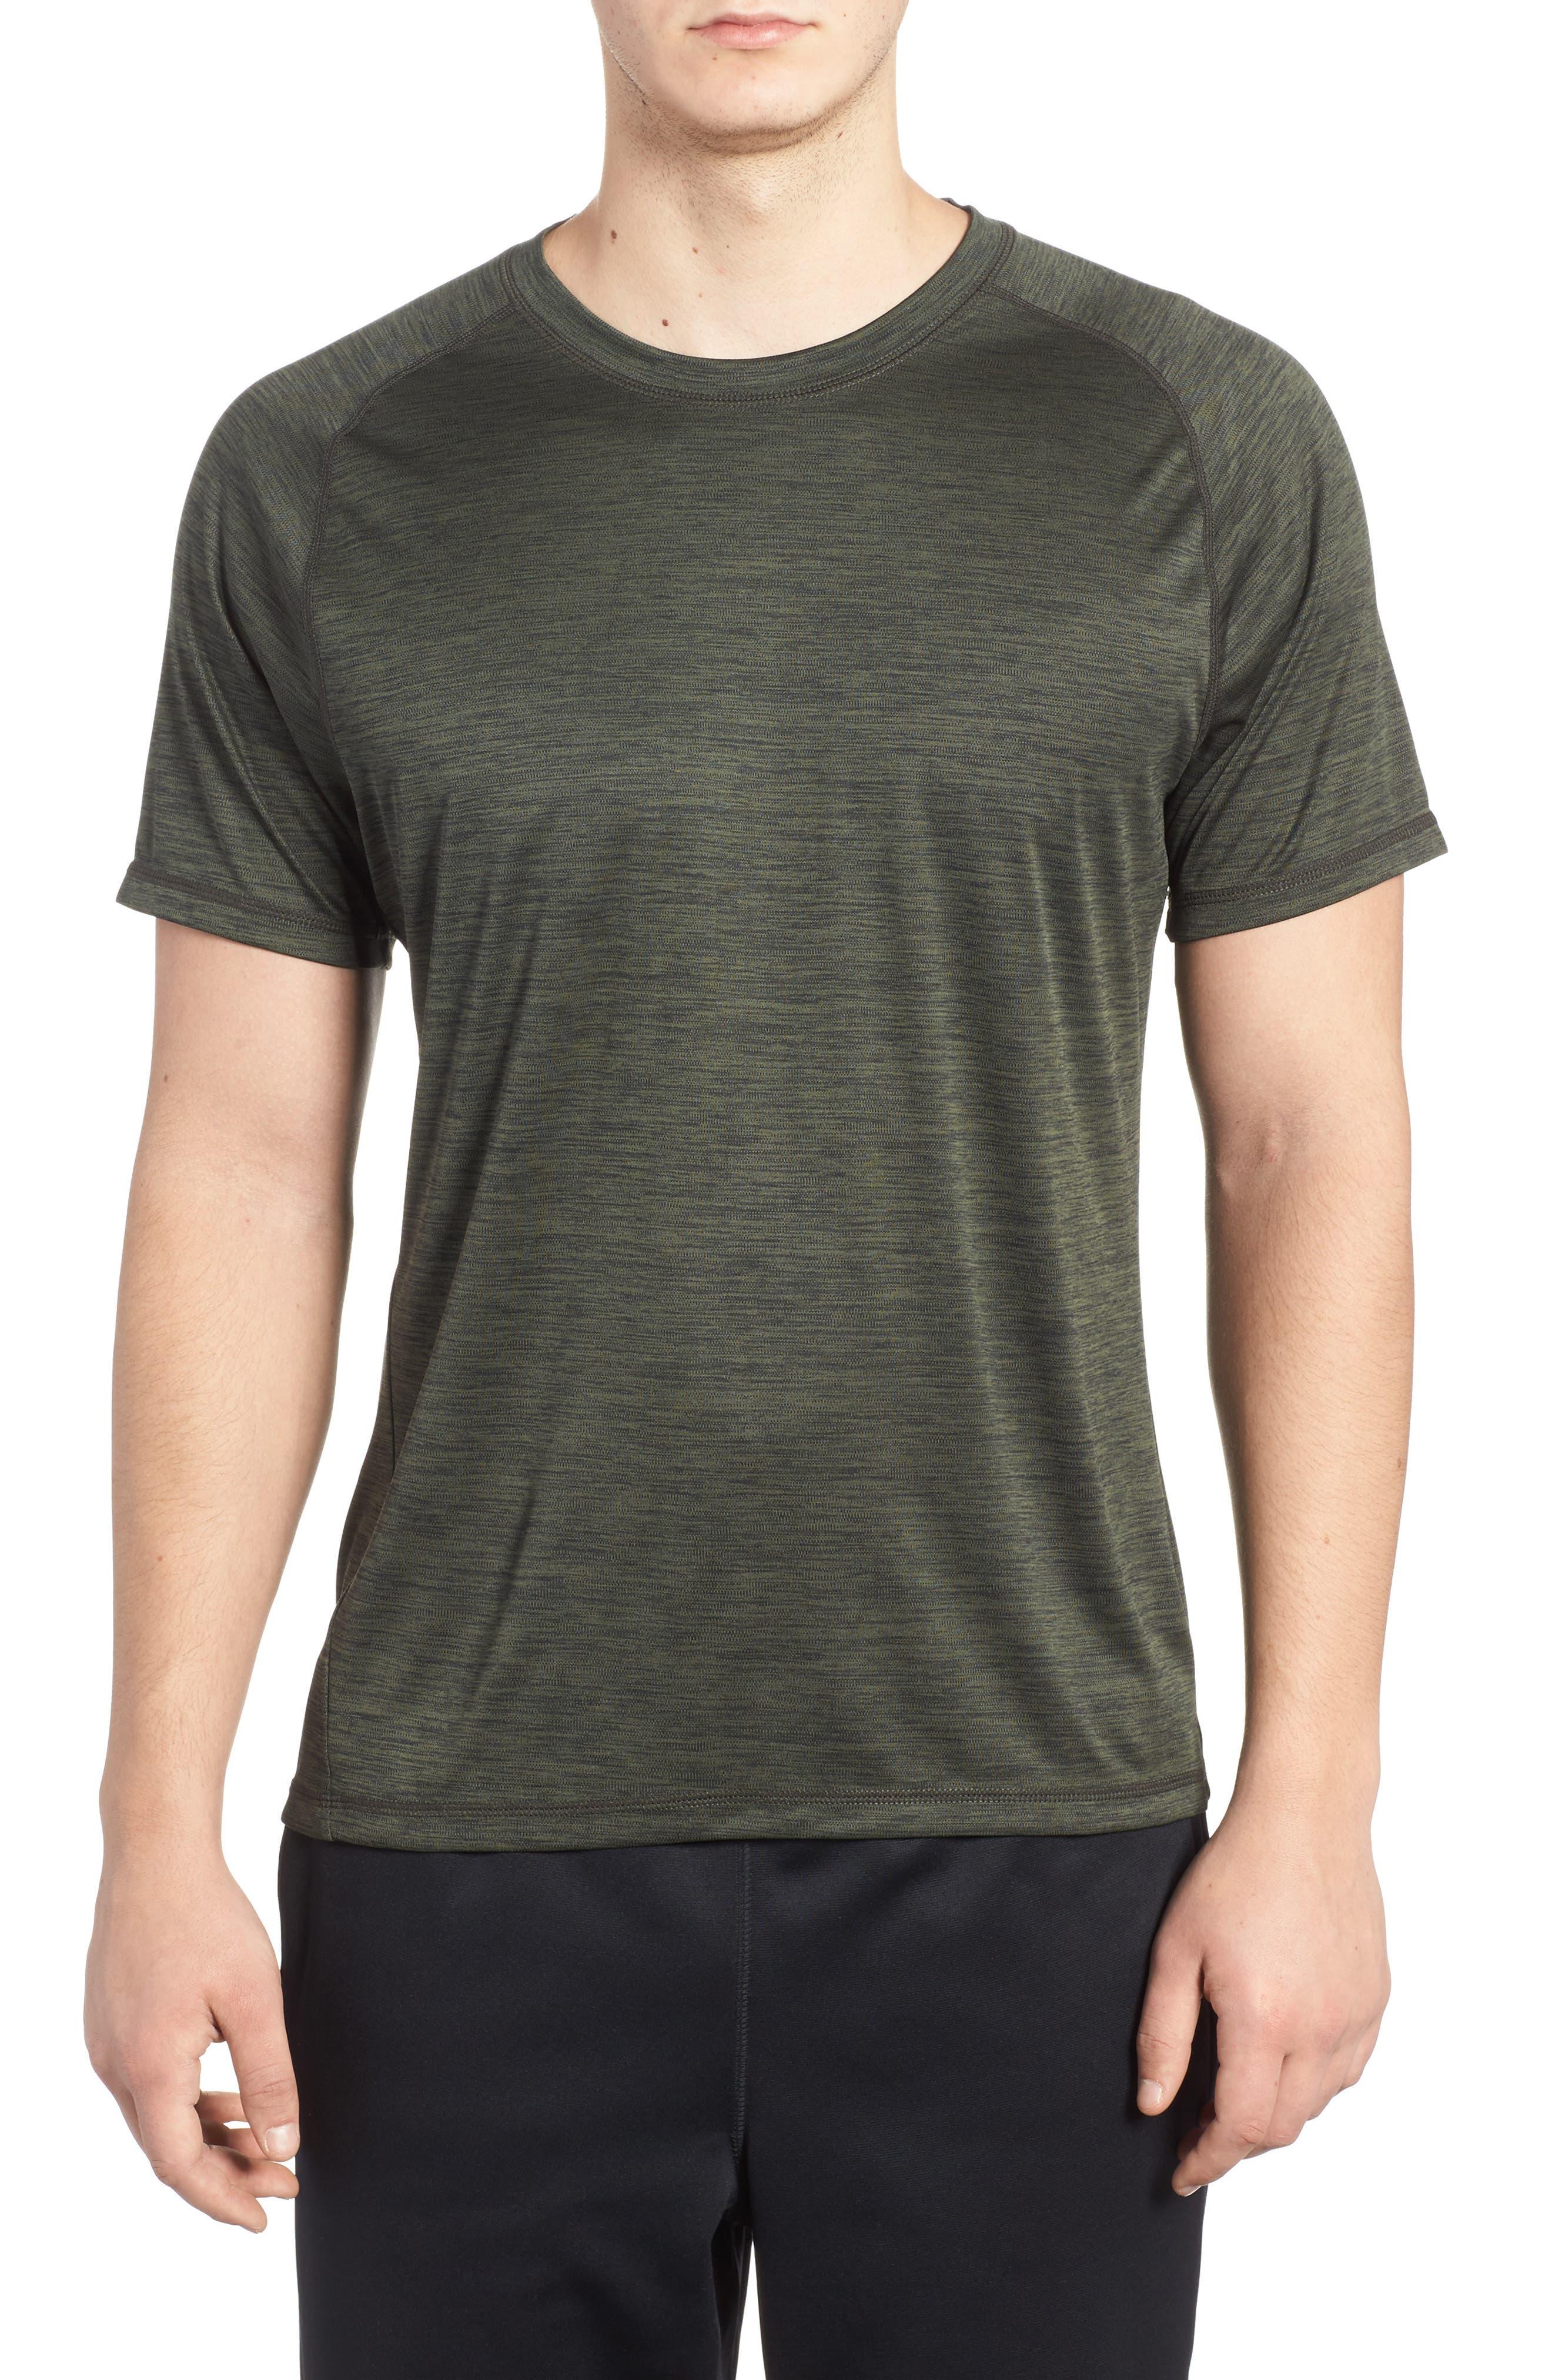 Alternate Image 1 Selected - Zella Triplite T-Shirt